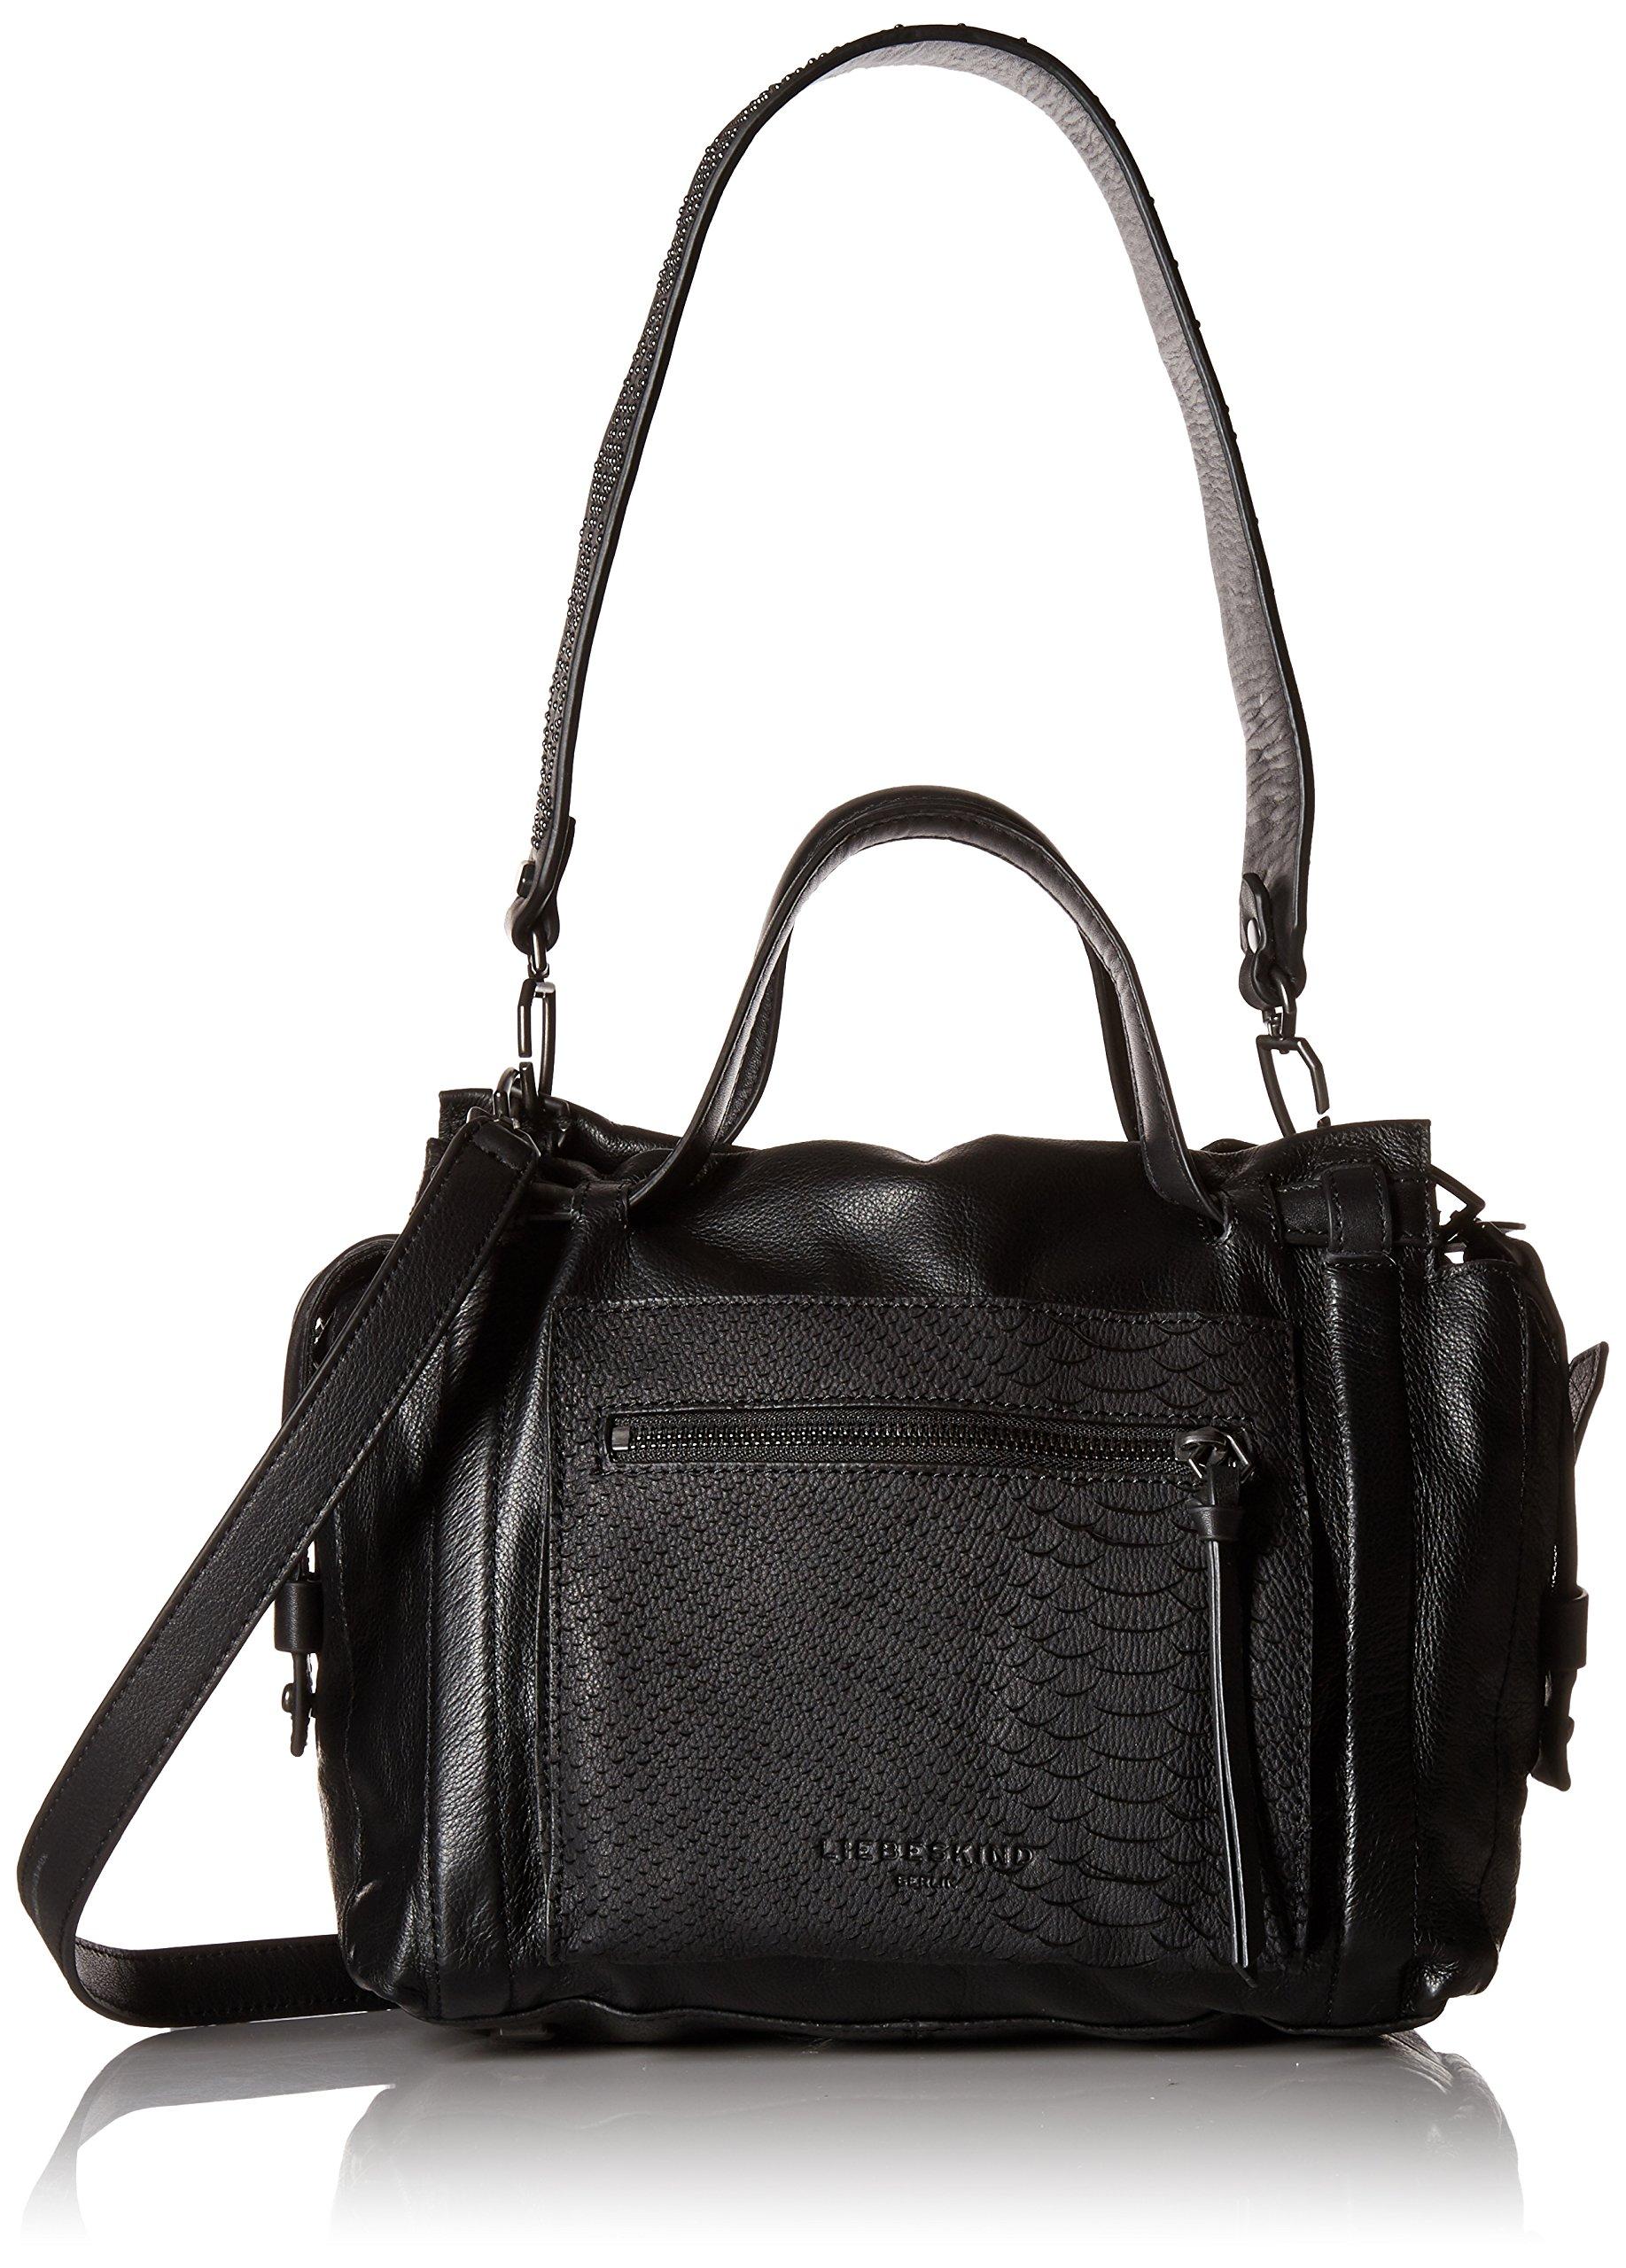 Liebeskind Berlin Women's Snakeskin and Studded Sporty Leather Satchel, Oil Black